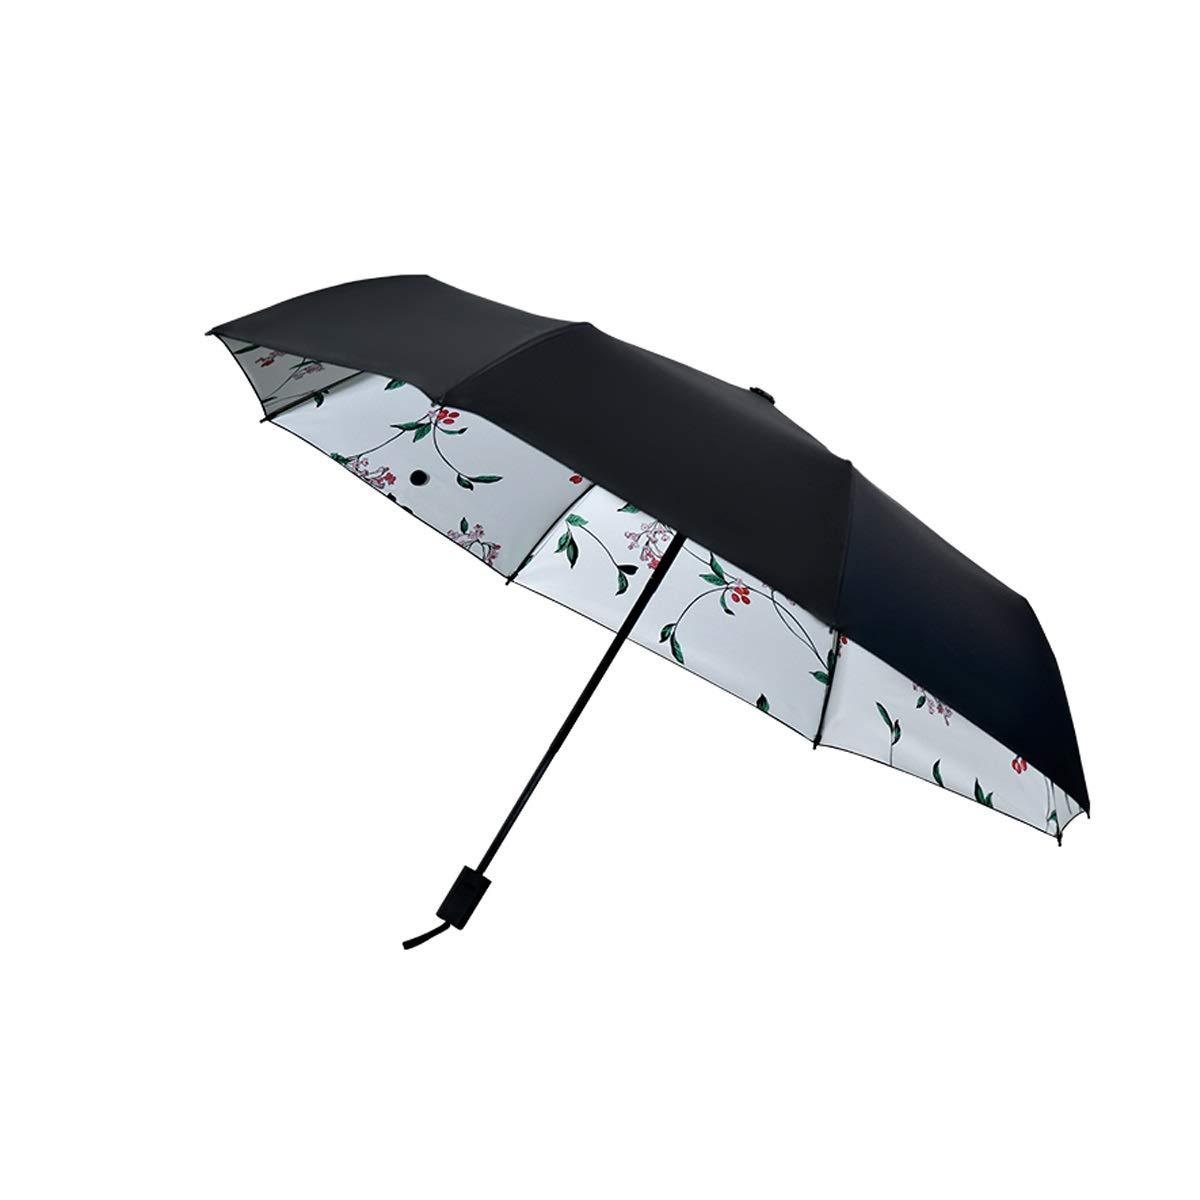 ebc0d1806d20 Amazon.com: Qinniao Umbrella 8 Skeleton, Black Plastic Sunscreen ...